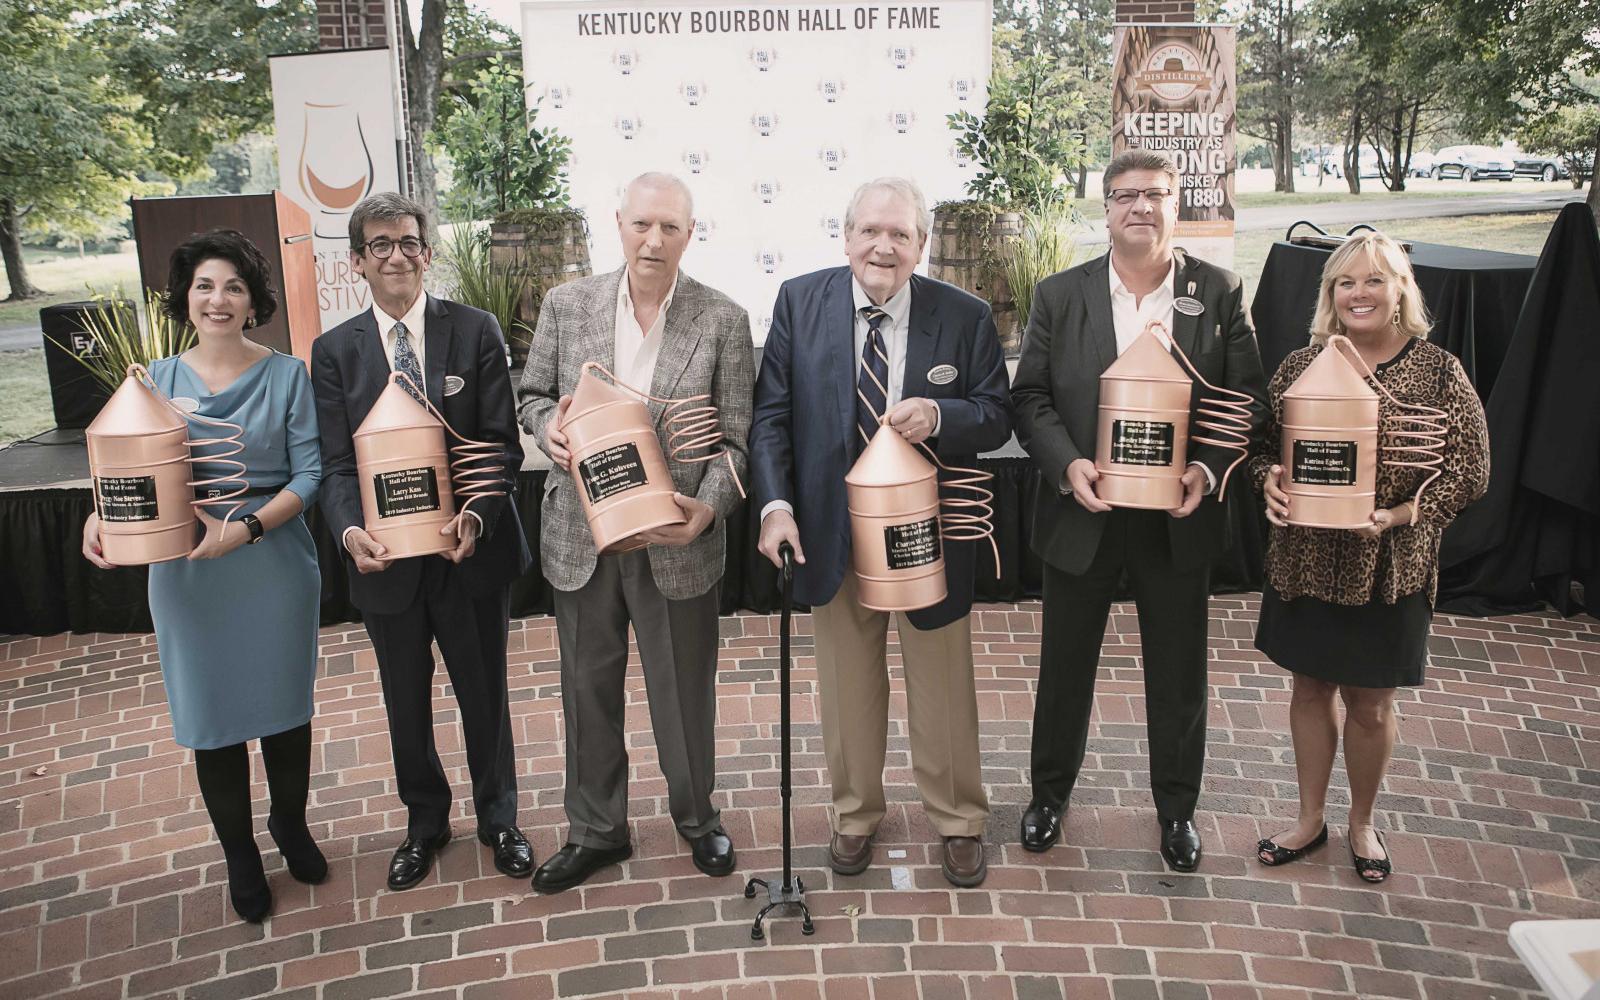 2019 recipients: Peggy Noe Stevens (left), Larry Kass, Even G. Kulsveen, Charles W. Medley, Wesley Henderson, and Katrina Egbert. Photo: The Bourbon Hall of Fame